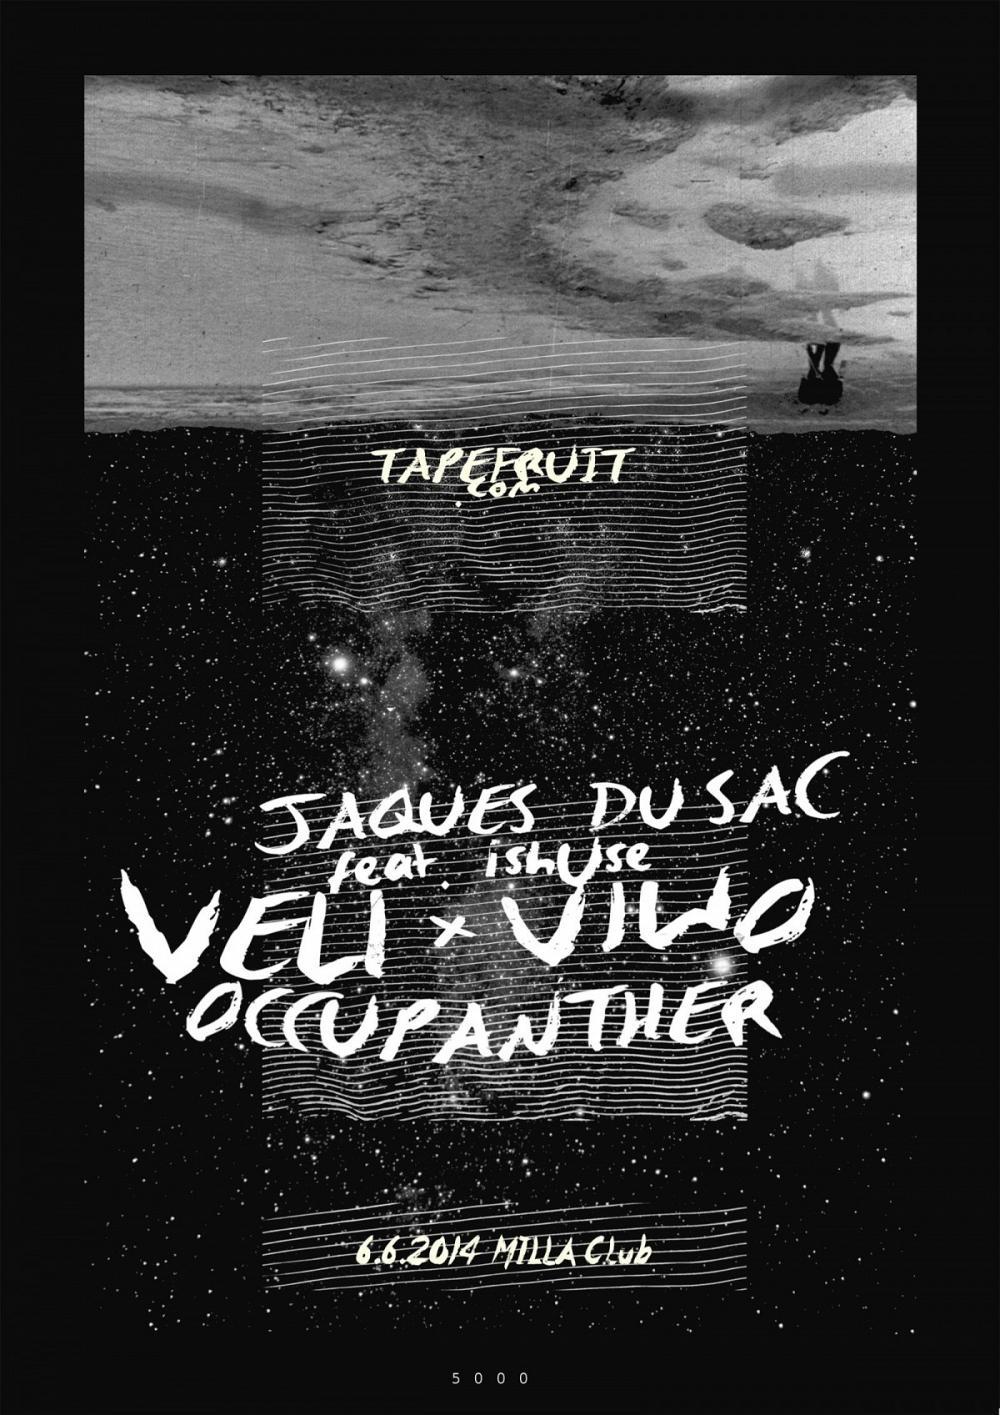 Tapefruit Konzert: Veli X Viwo + Occupanther + Jaques du Sac + ishUse | 06.06.2014 @ Milla Club